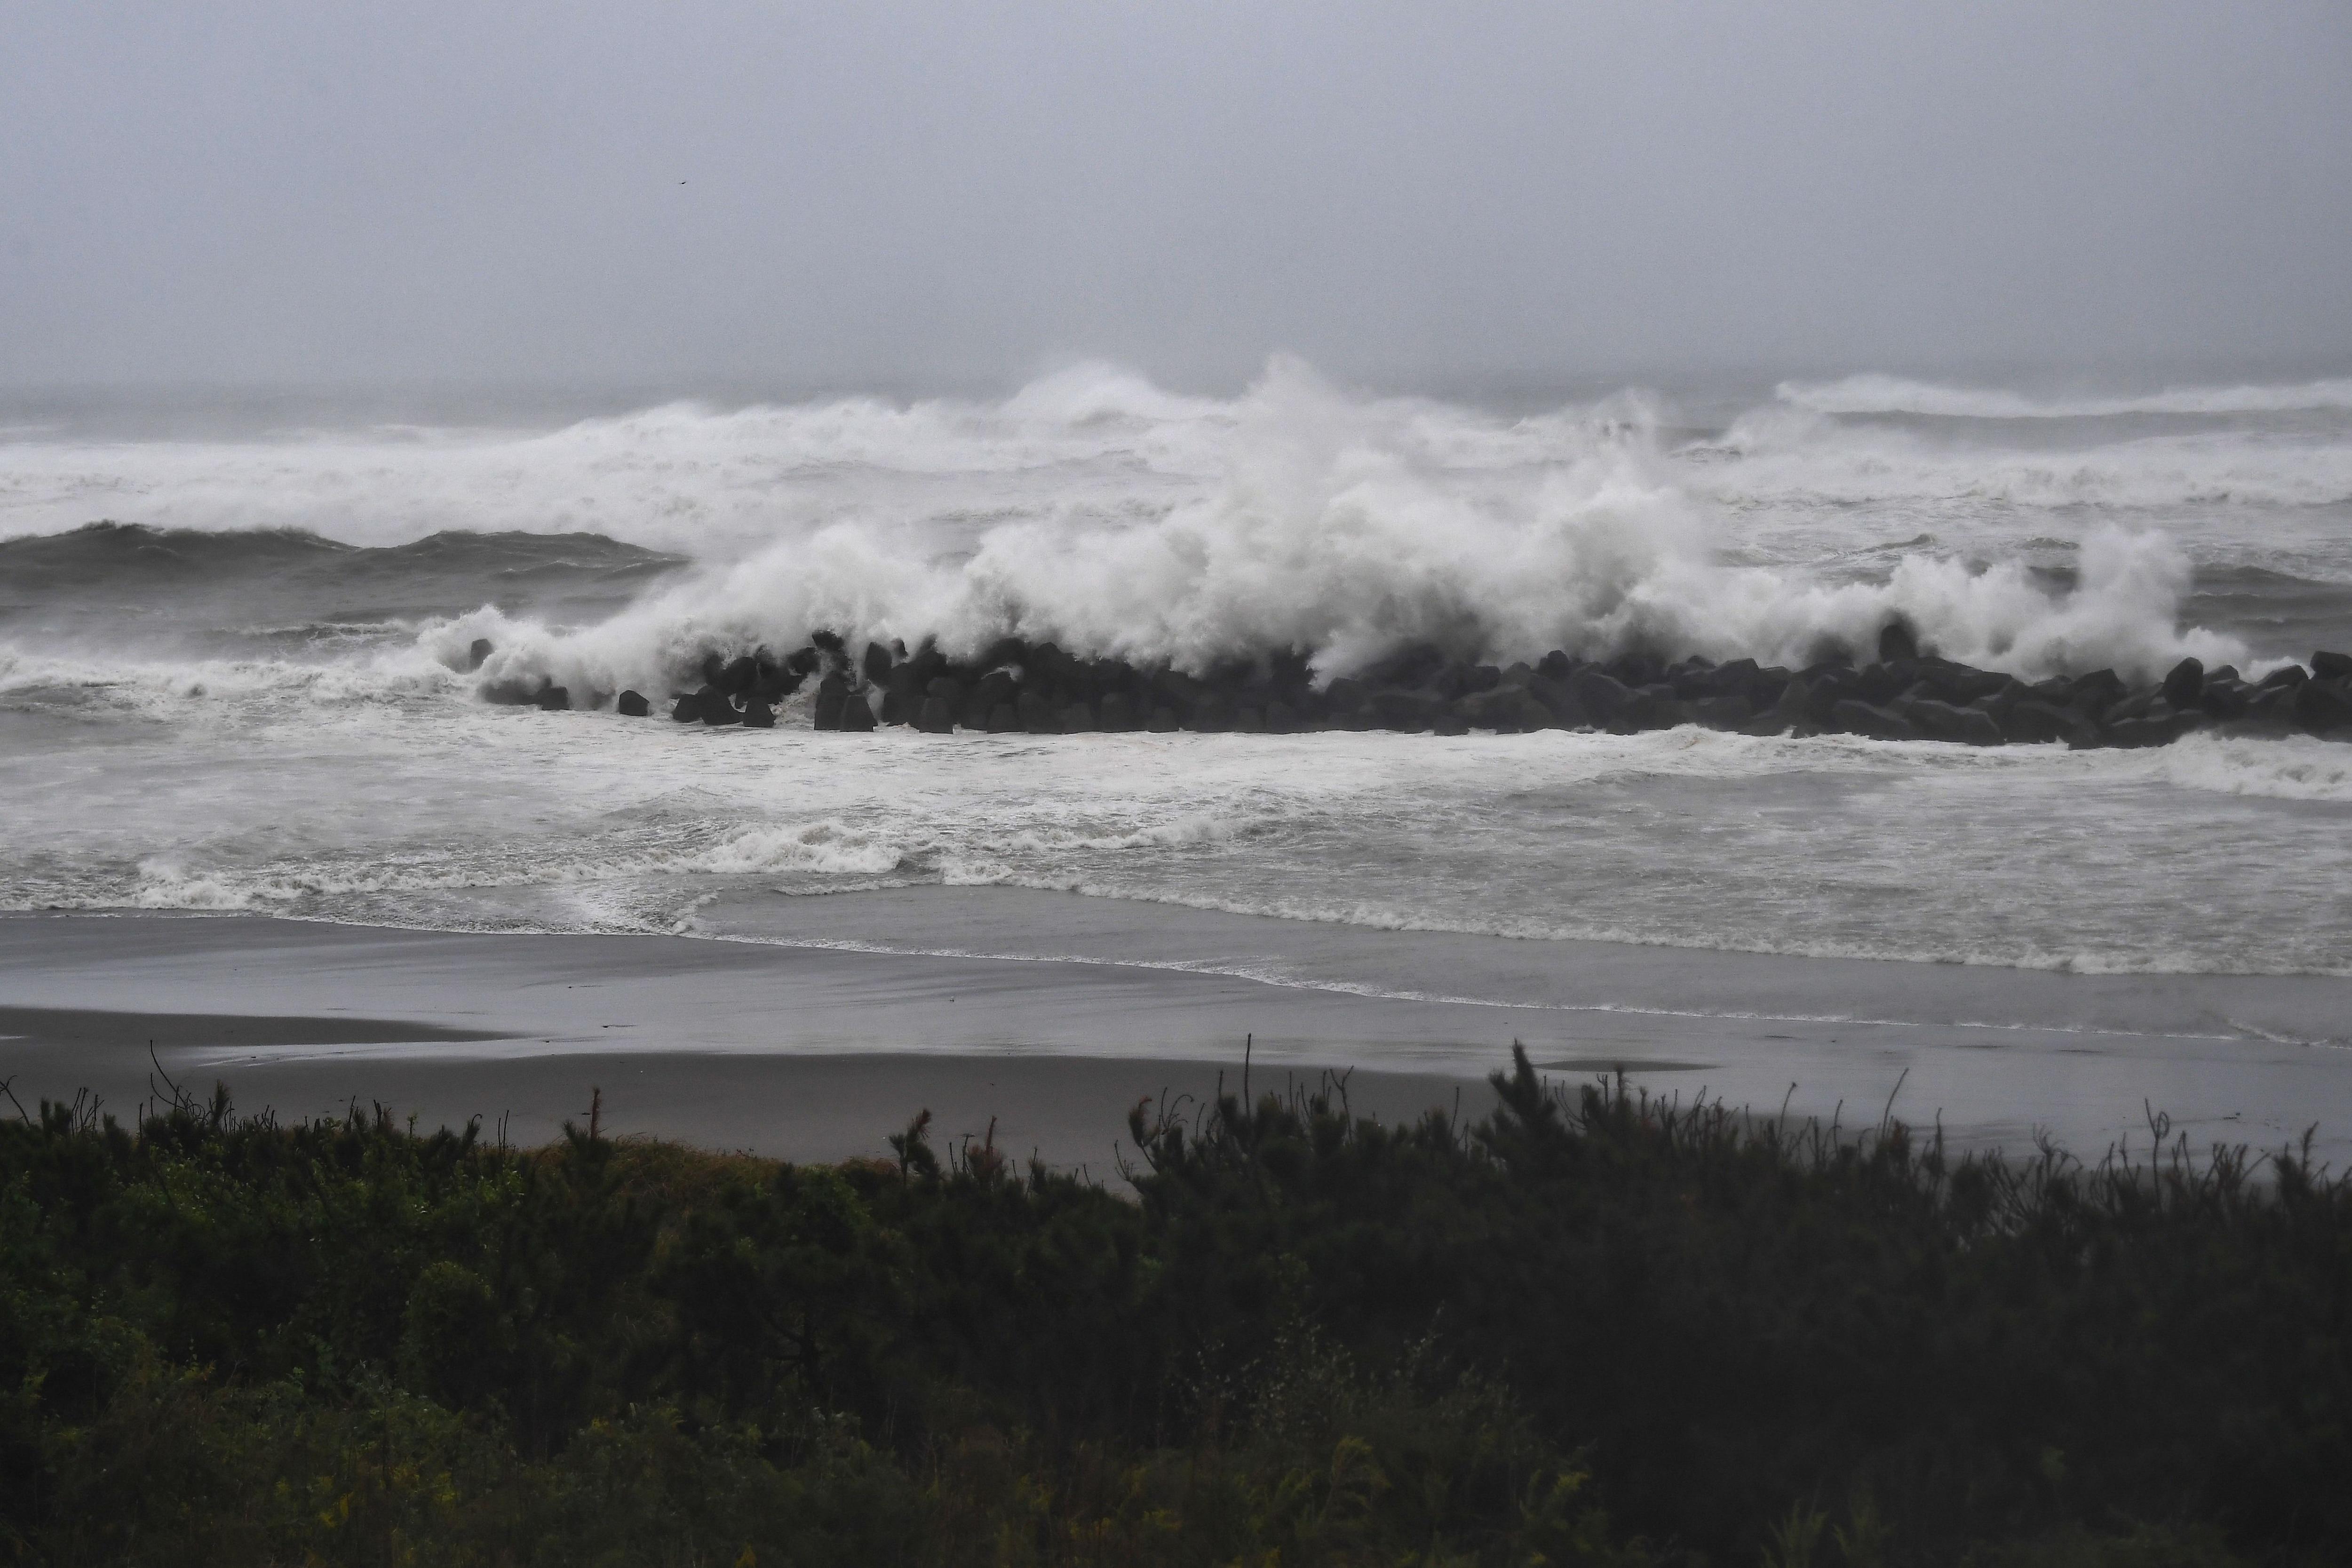 Strong waves hit a seawall along the coast in Hamamatsu.